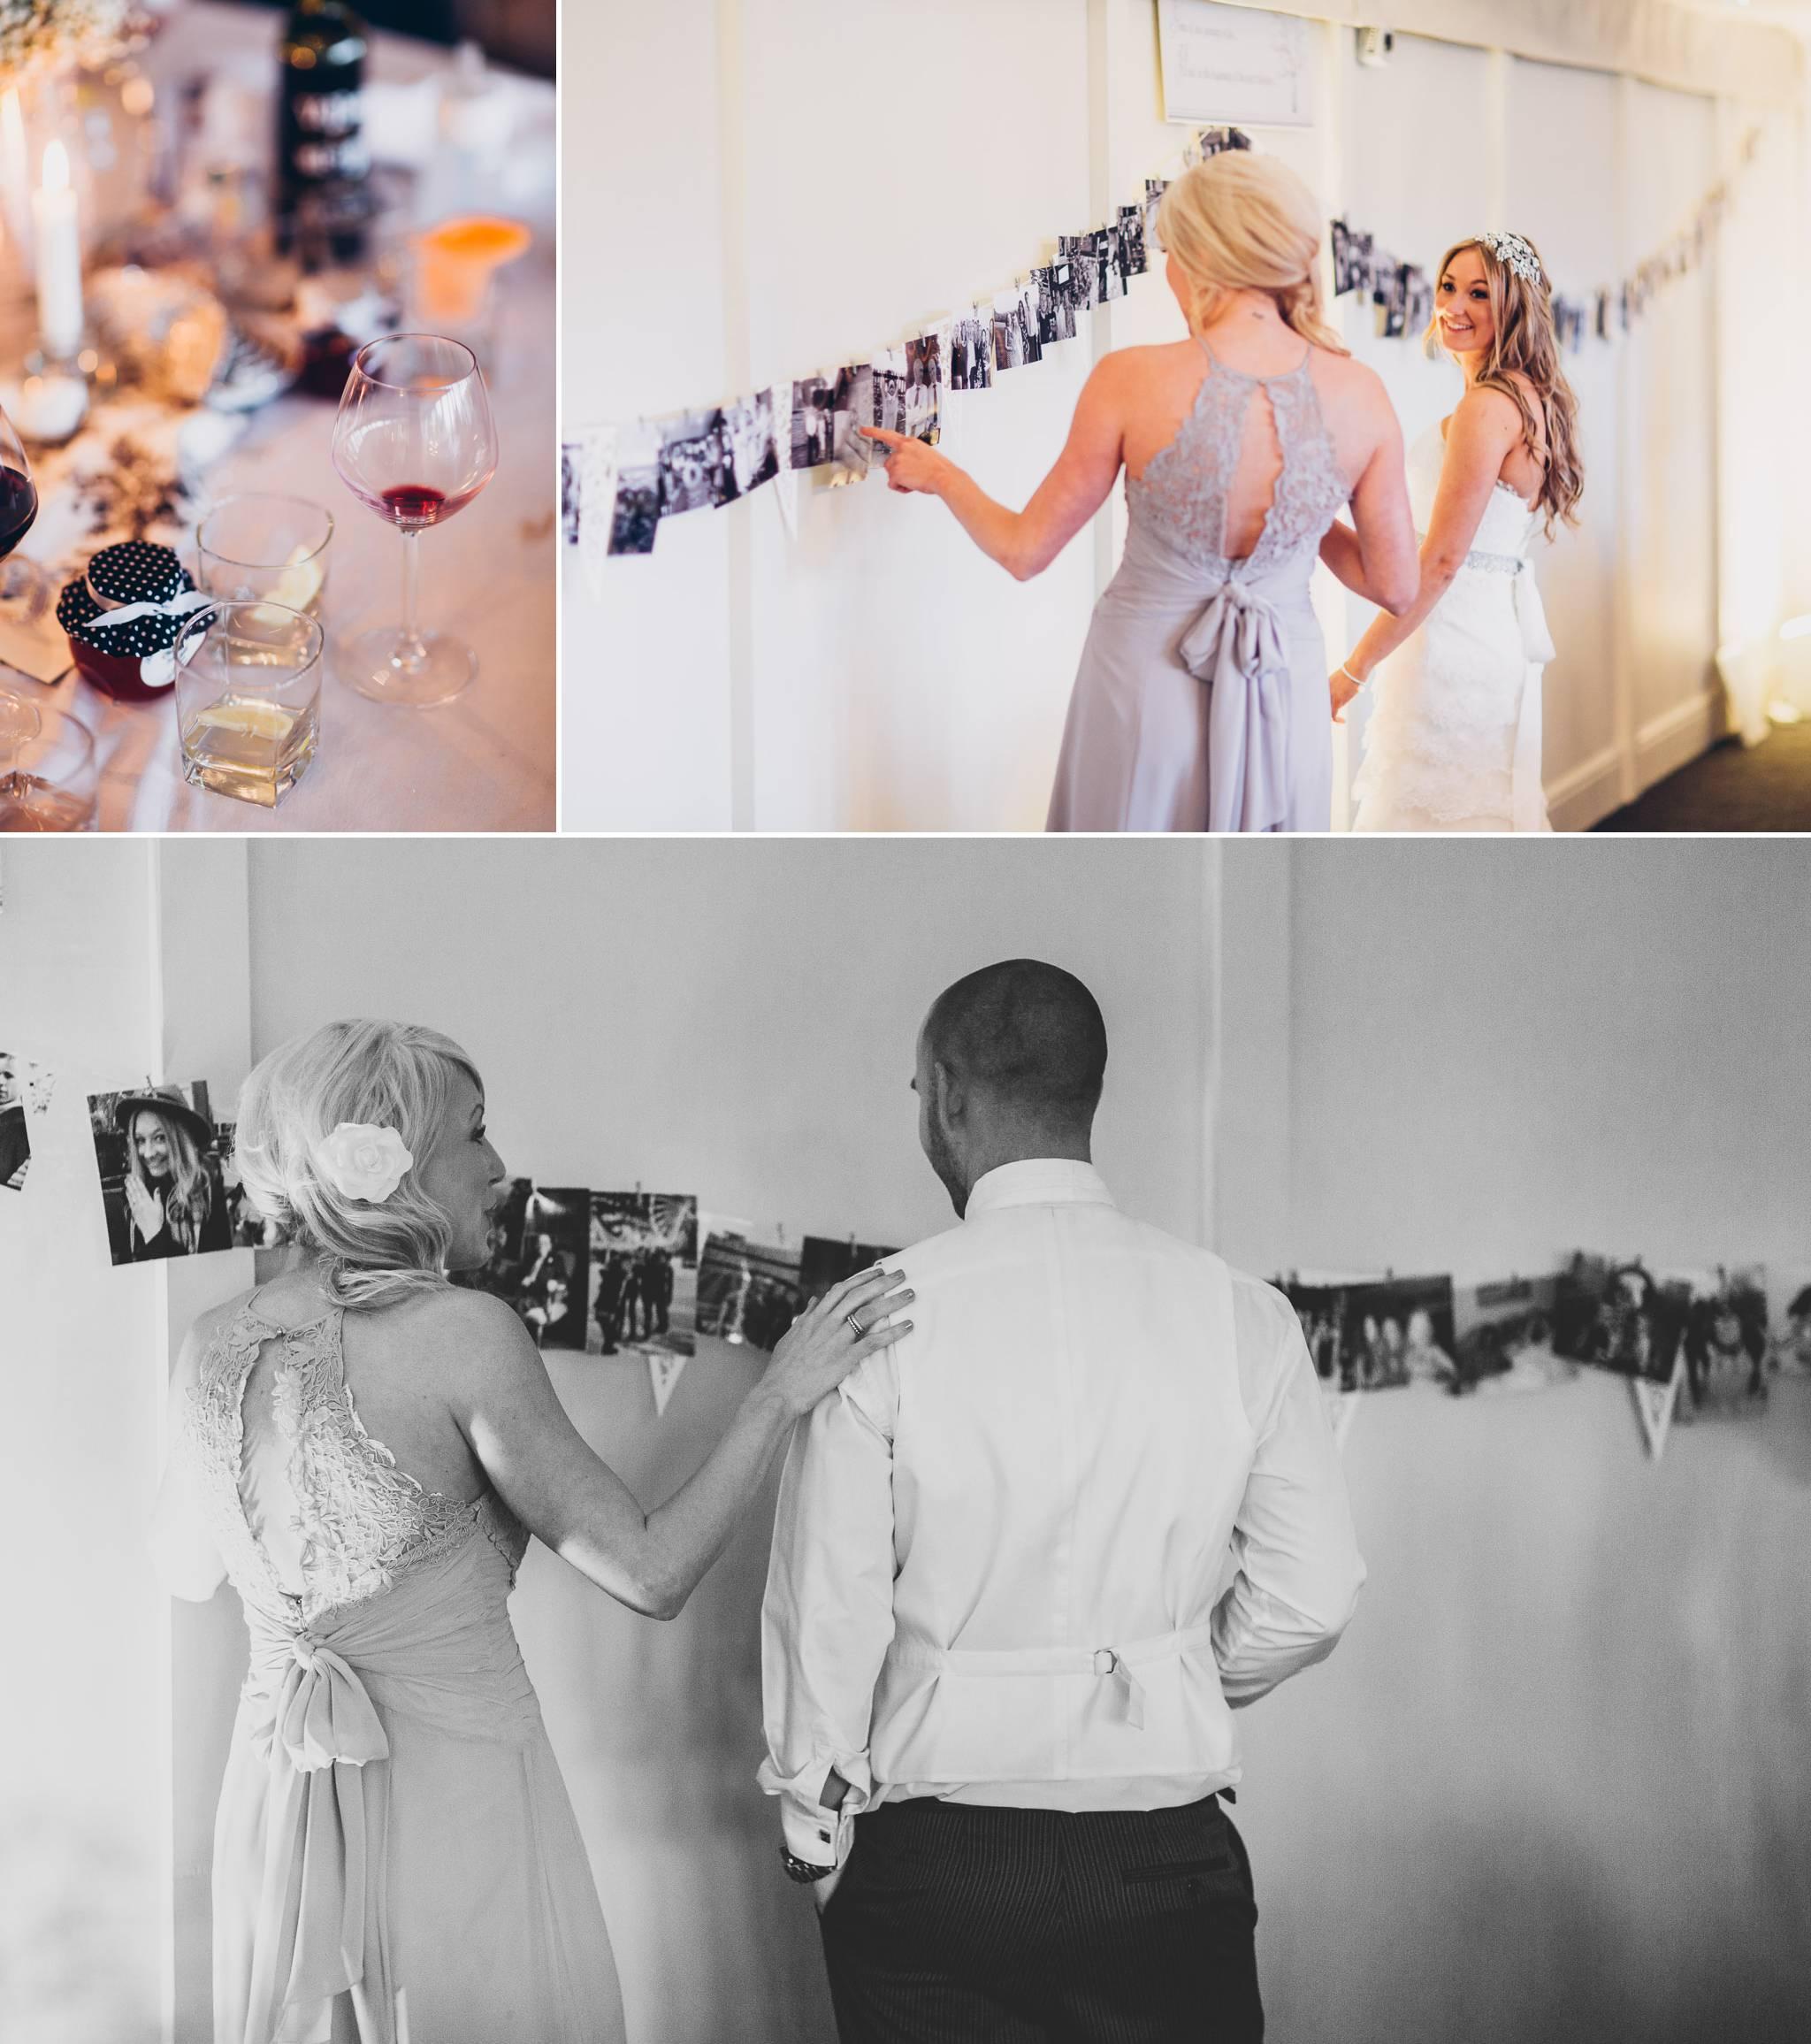 shropshire-wedding-photography 29.jpg